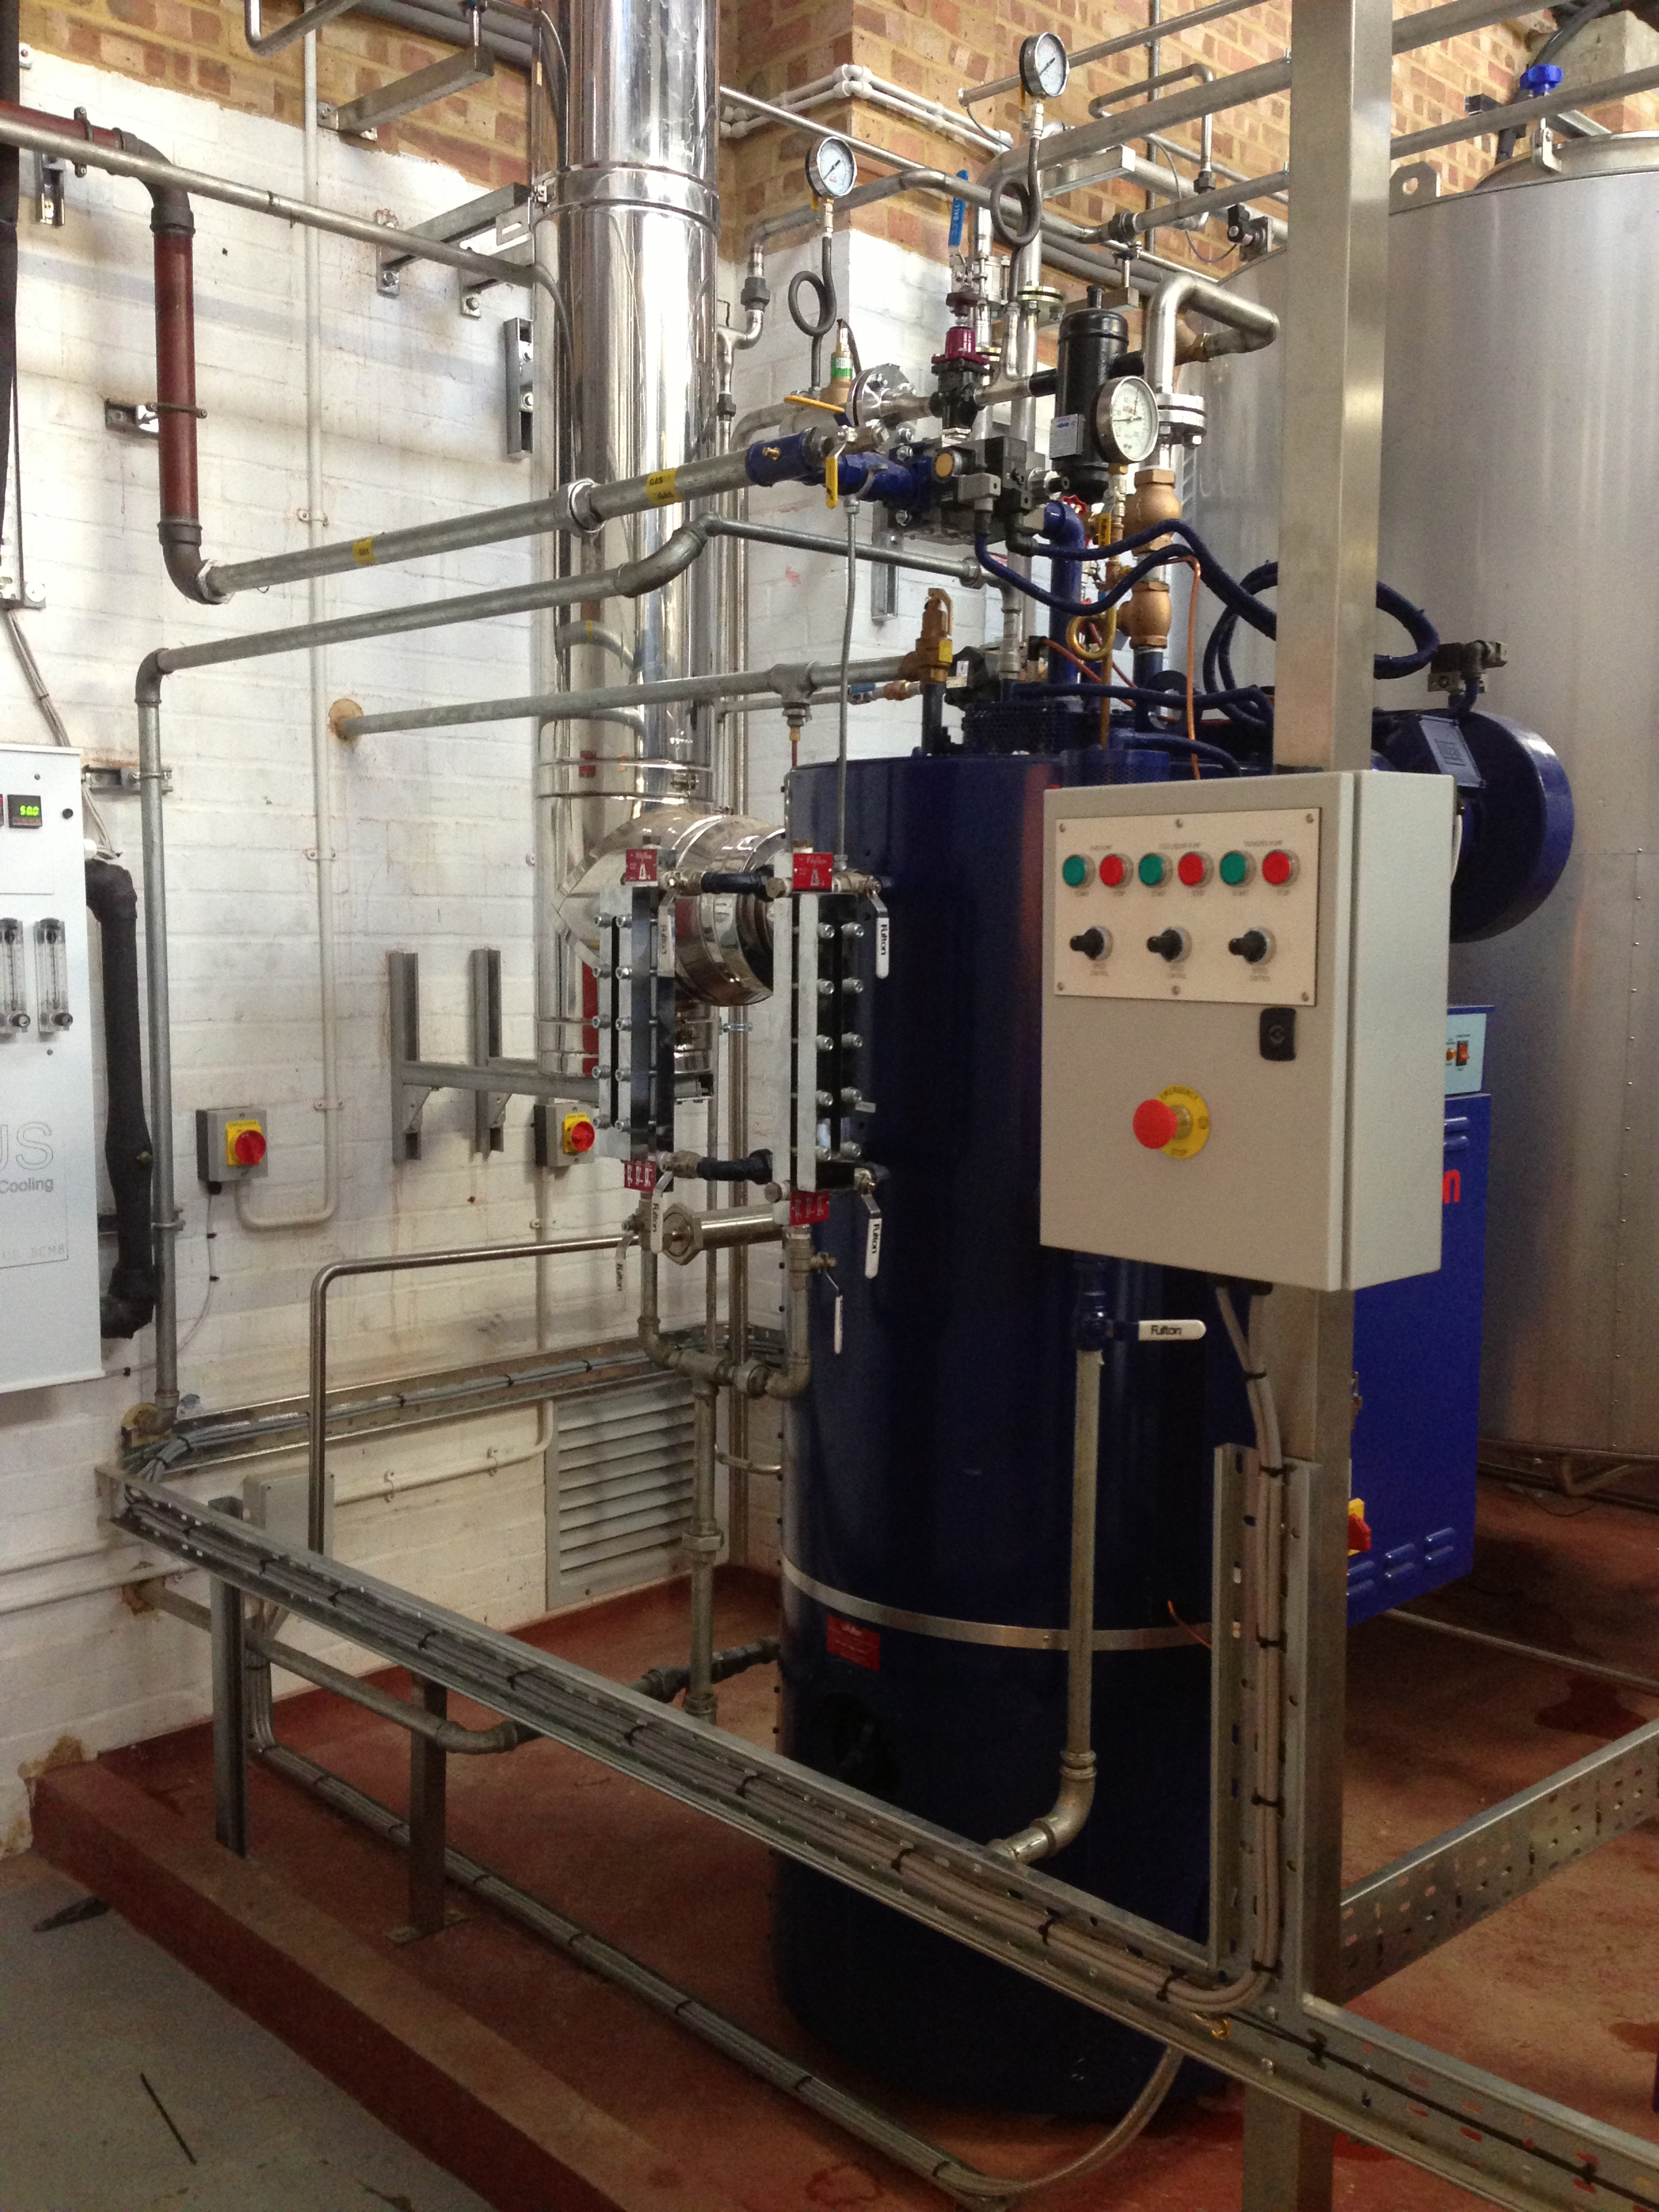 Gas fired steam boiler for Gypsy Hill Brewery (3).JPG